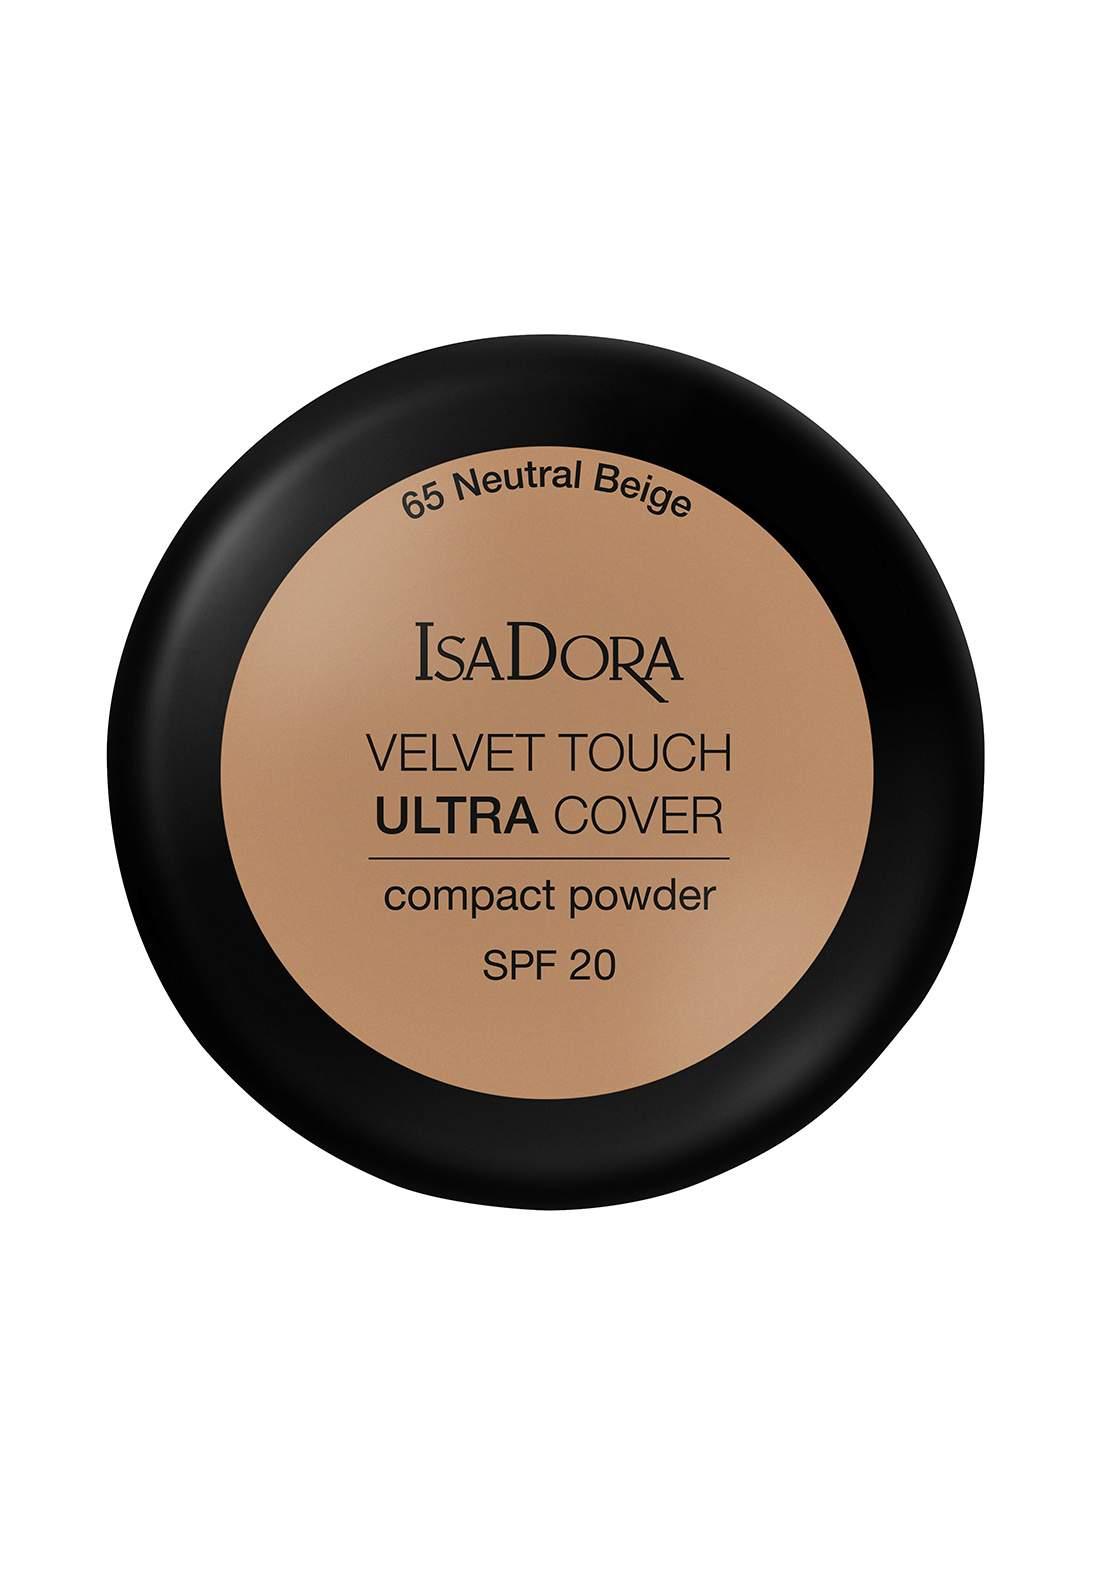 IsaDora 317103 Velvet Touch Sheer Cover Compact Powder Neutral Beige SPF 20 NO.65 بودرة